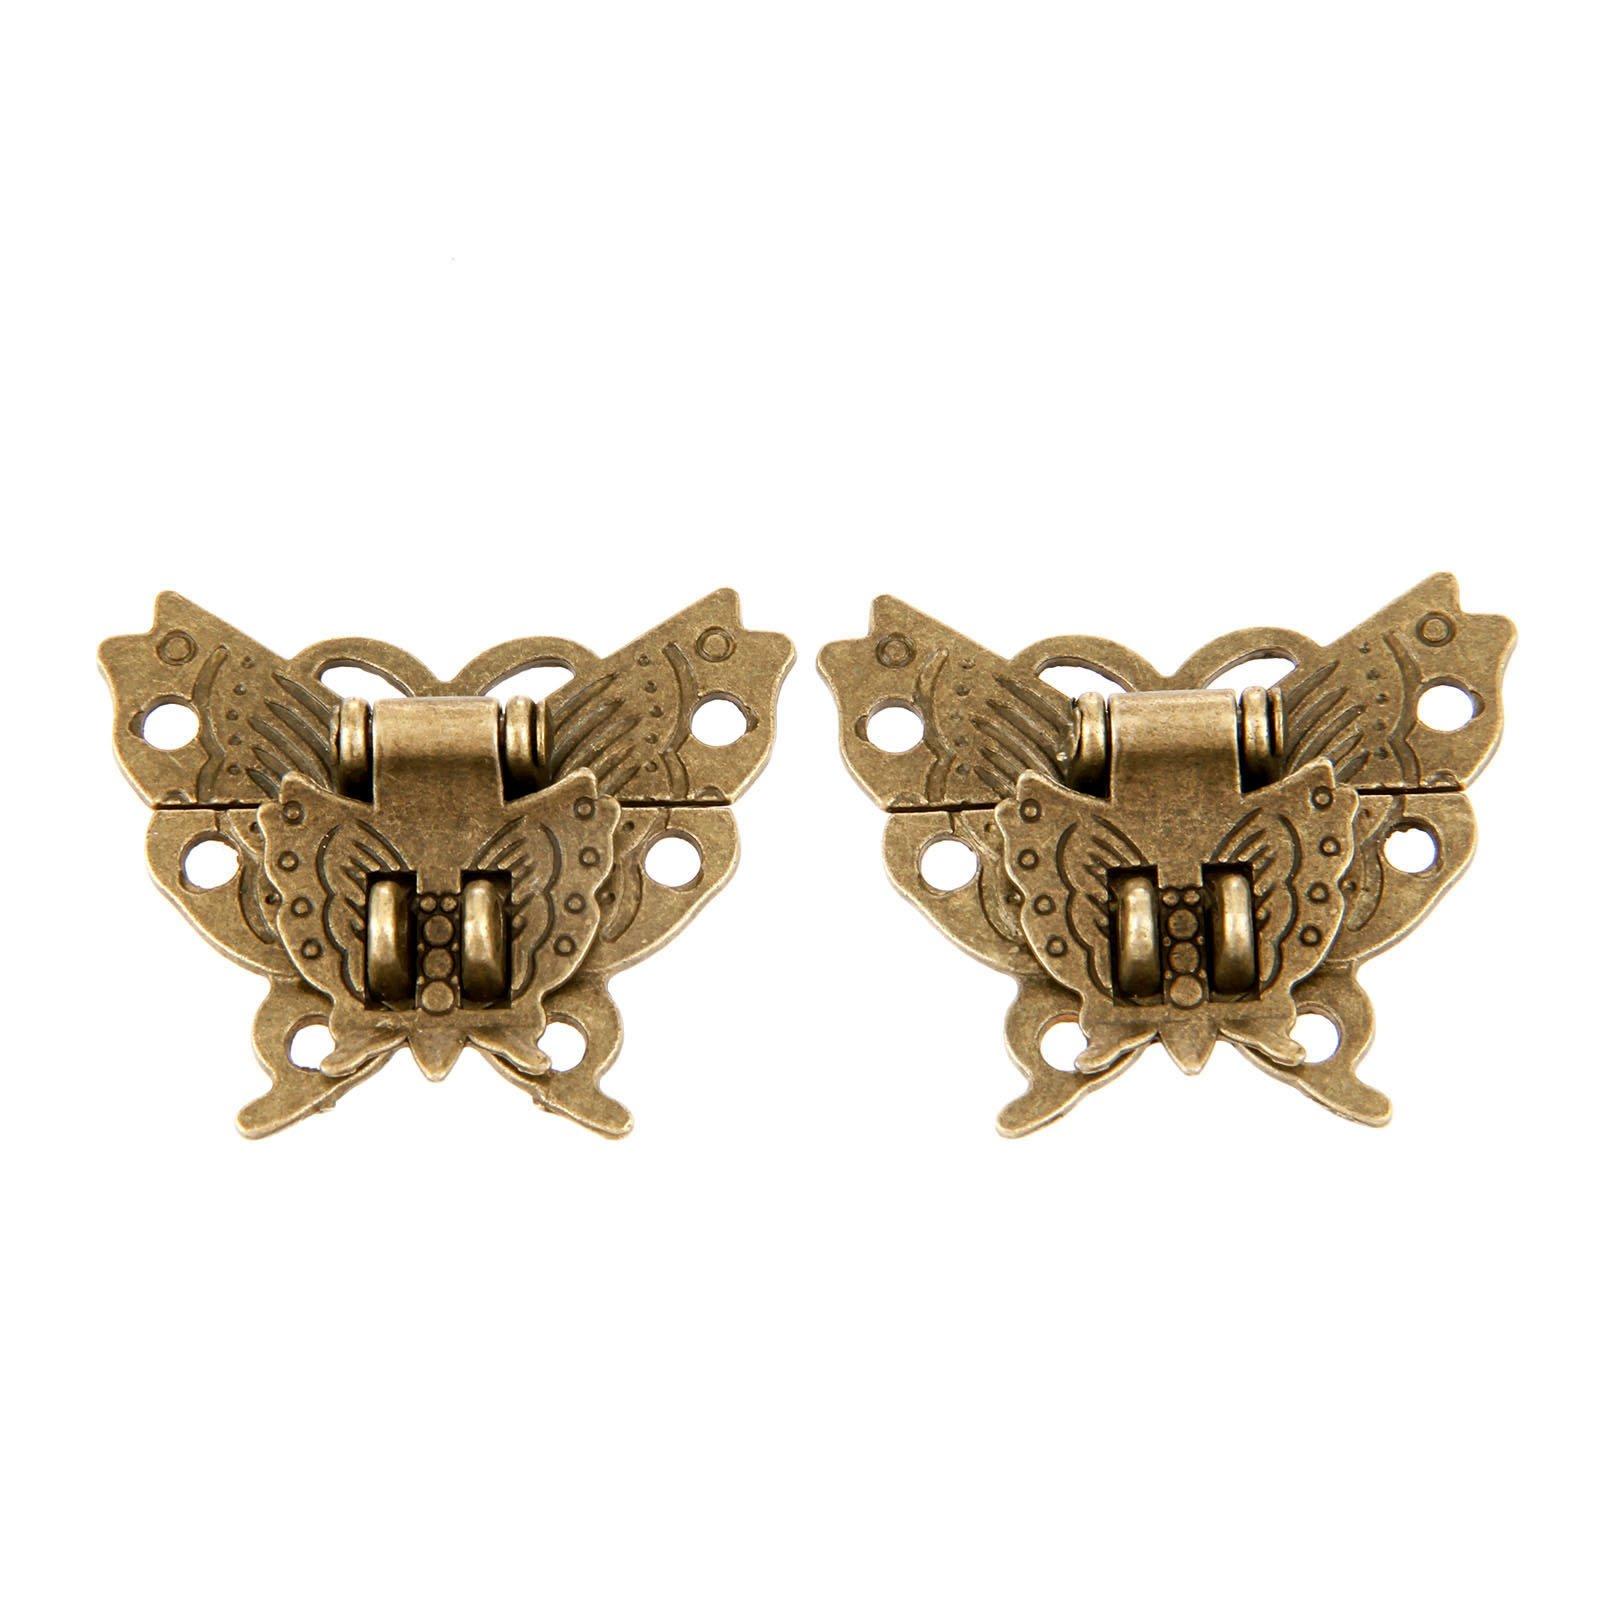 Dophee 10Pcs Retro 39x45mm Chic Butterfly Latch Catch Jewelry Wooden Box Lock Hasp Pad Chest Lock